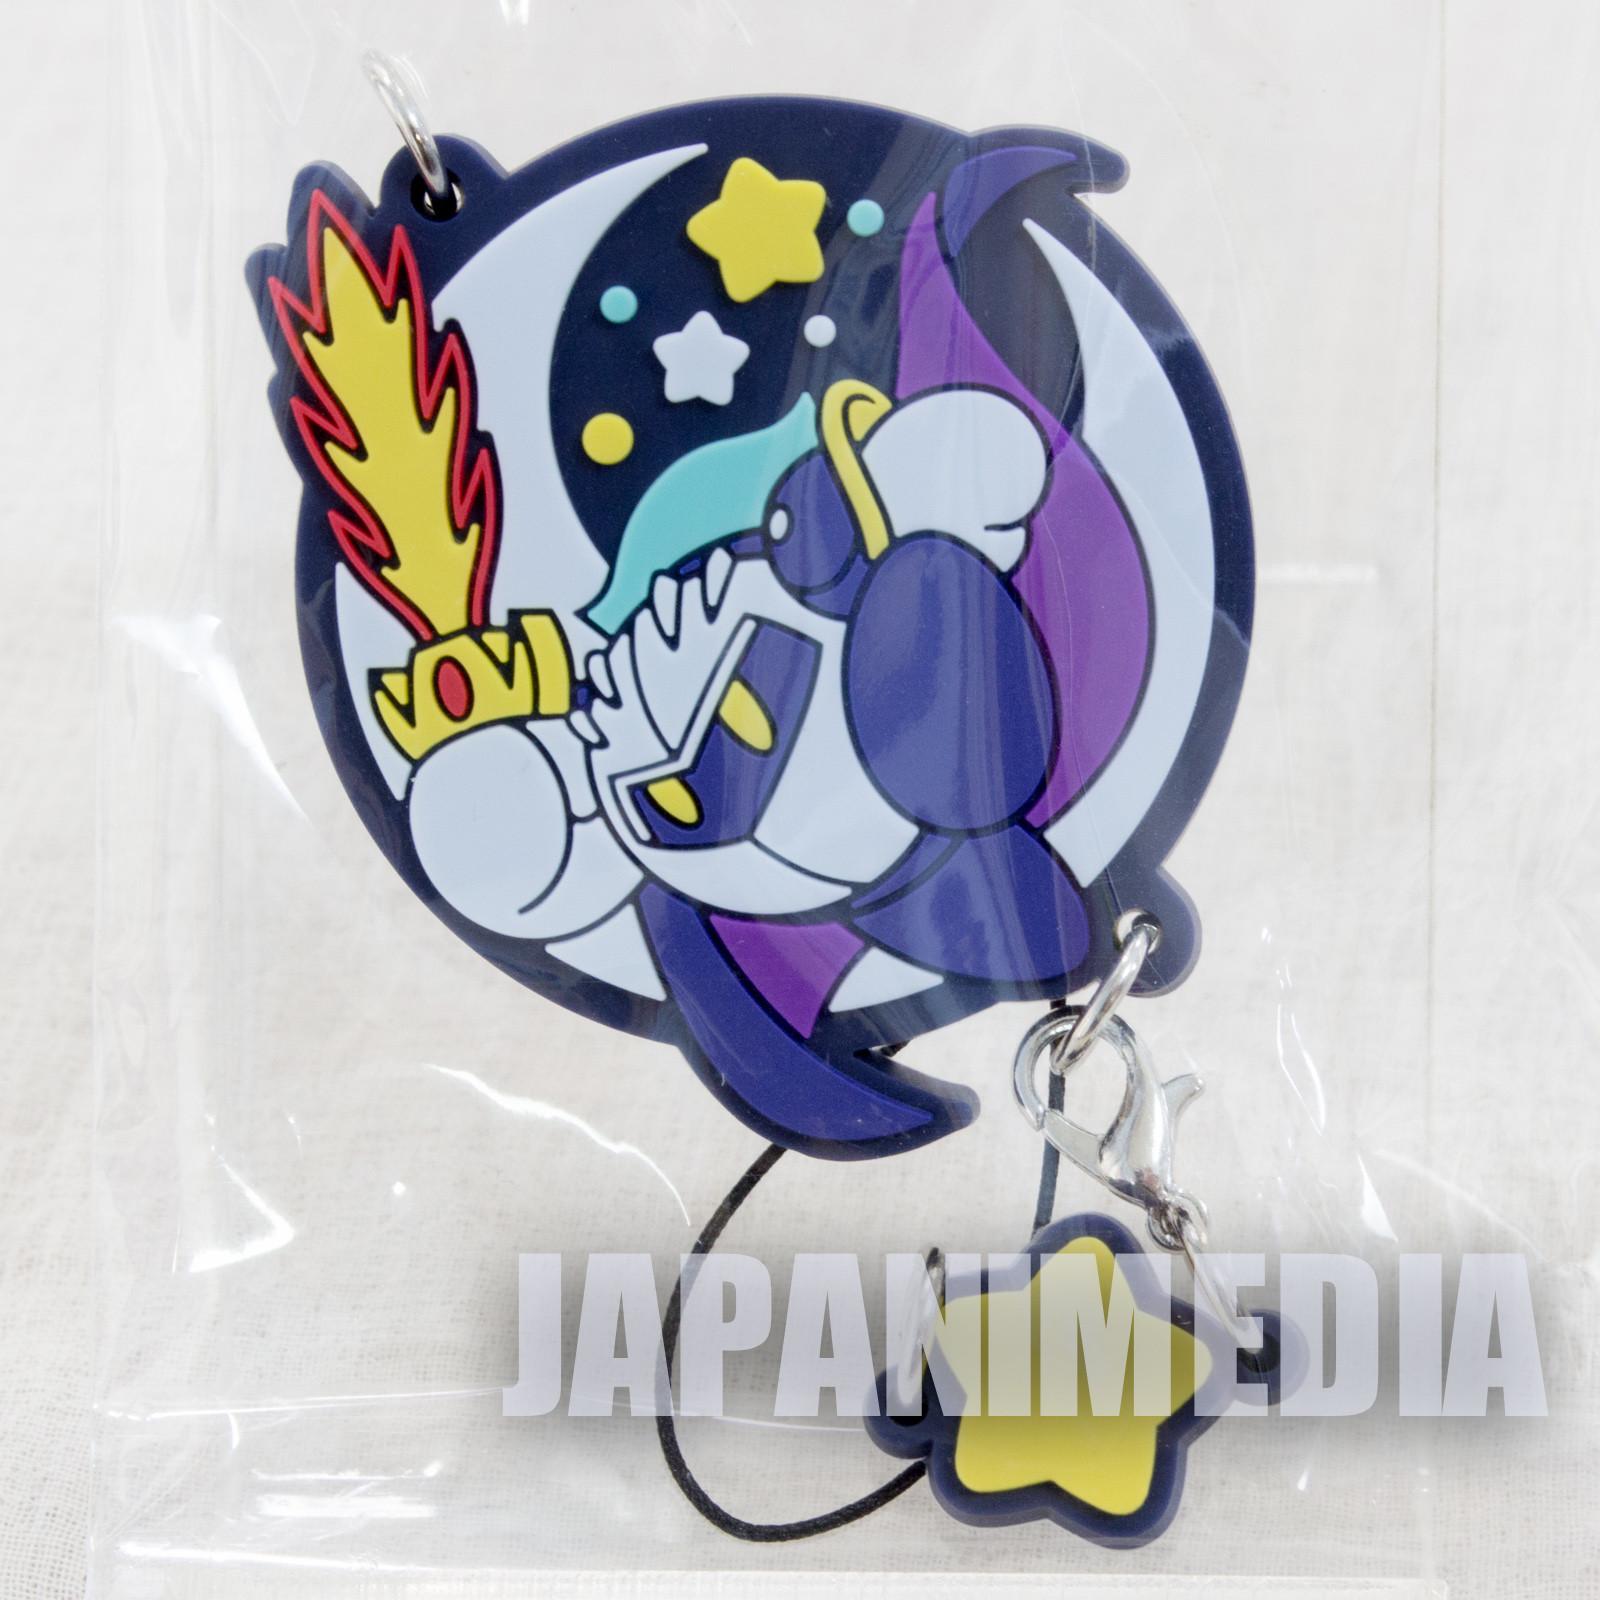 Kirby Super Star Mascot Rubber Strap Meta Knight ver. Banpresto JAPAN NINTNEDO